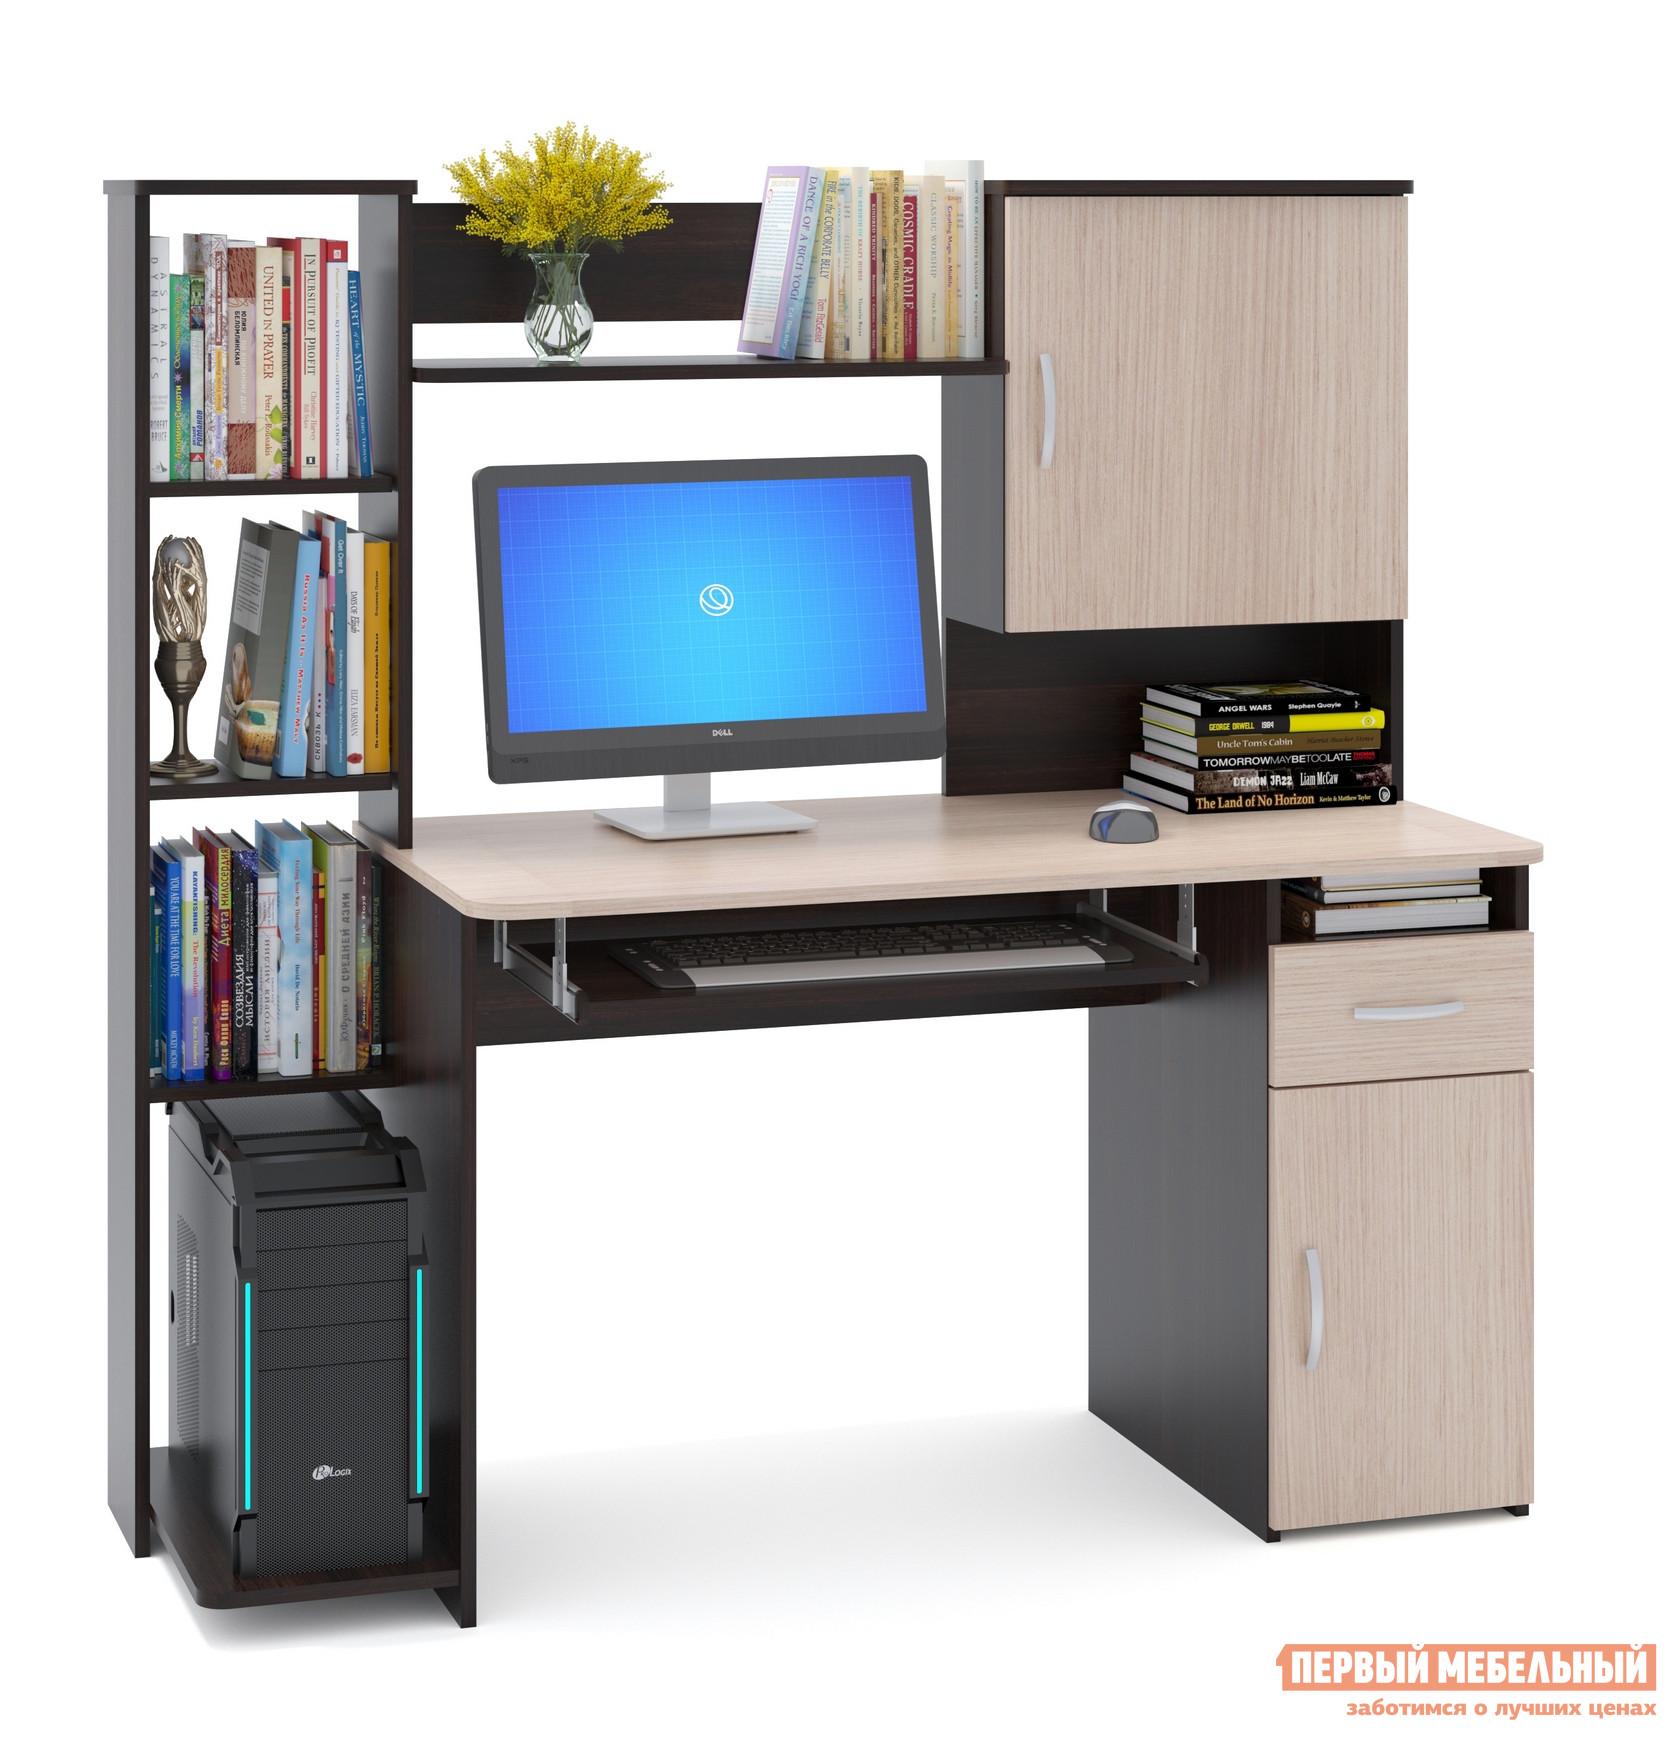 Компьютерный стол Сокол КСТ-11.1 Корпус Венге / Фасад Беленый дуб